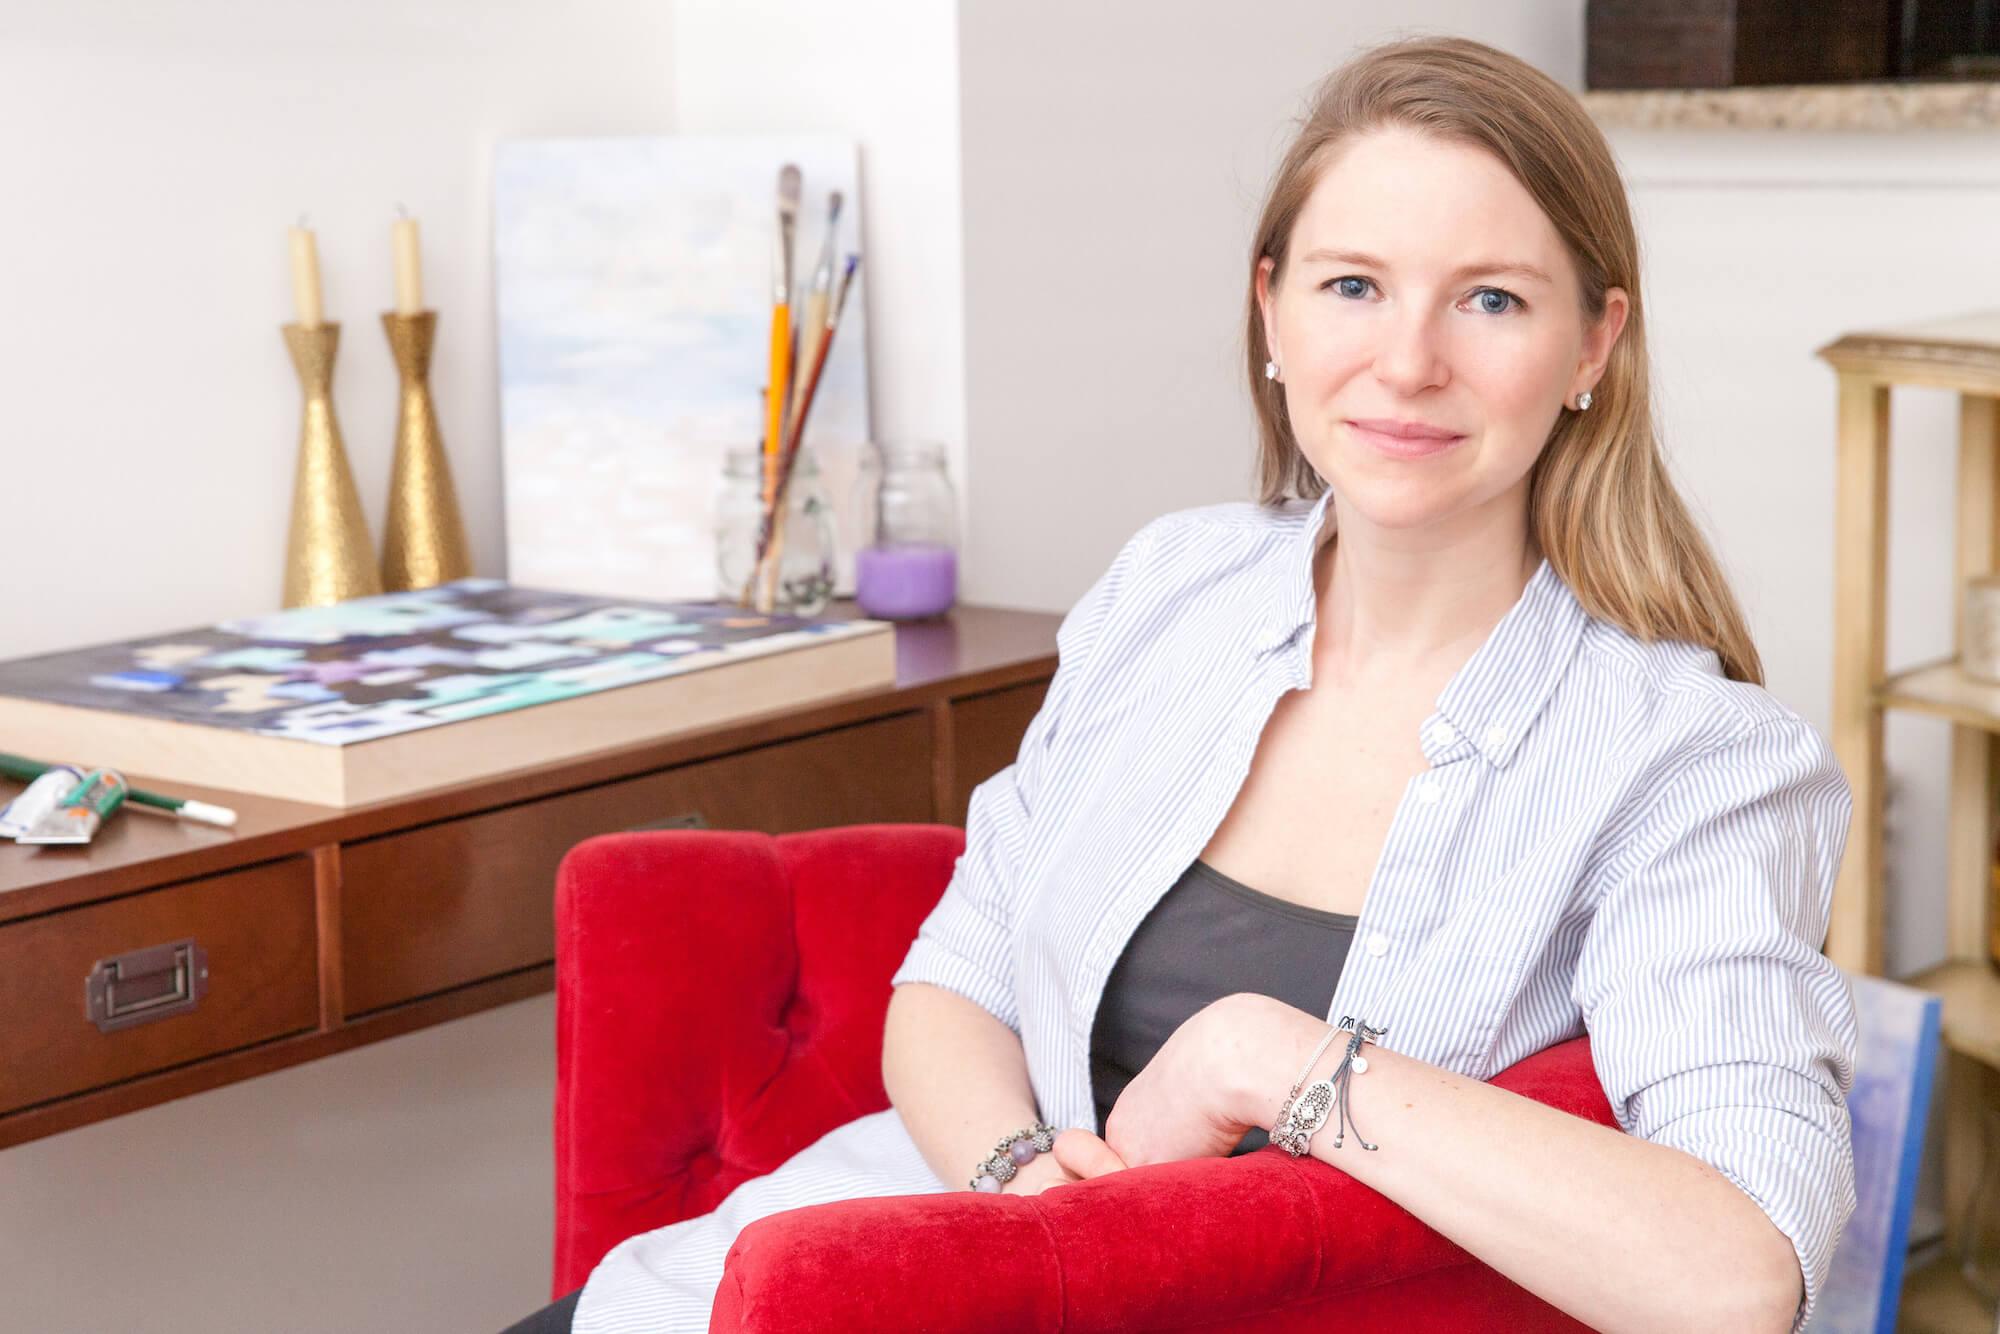 hannah-lowe-corman-mindfulness-painter-studio.jpg